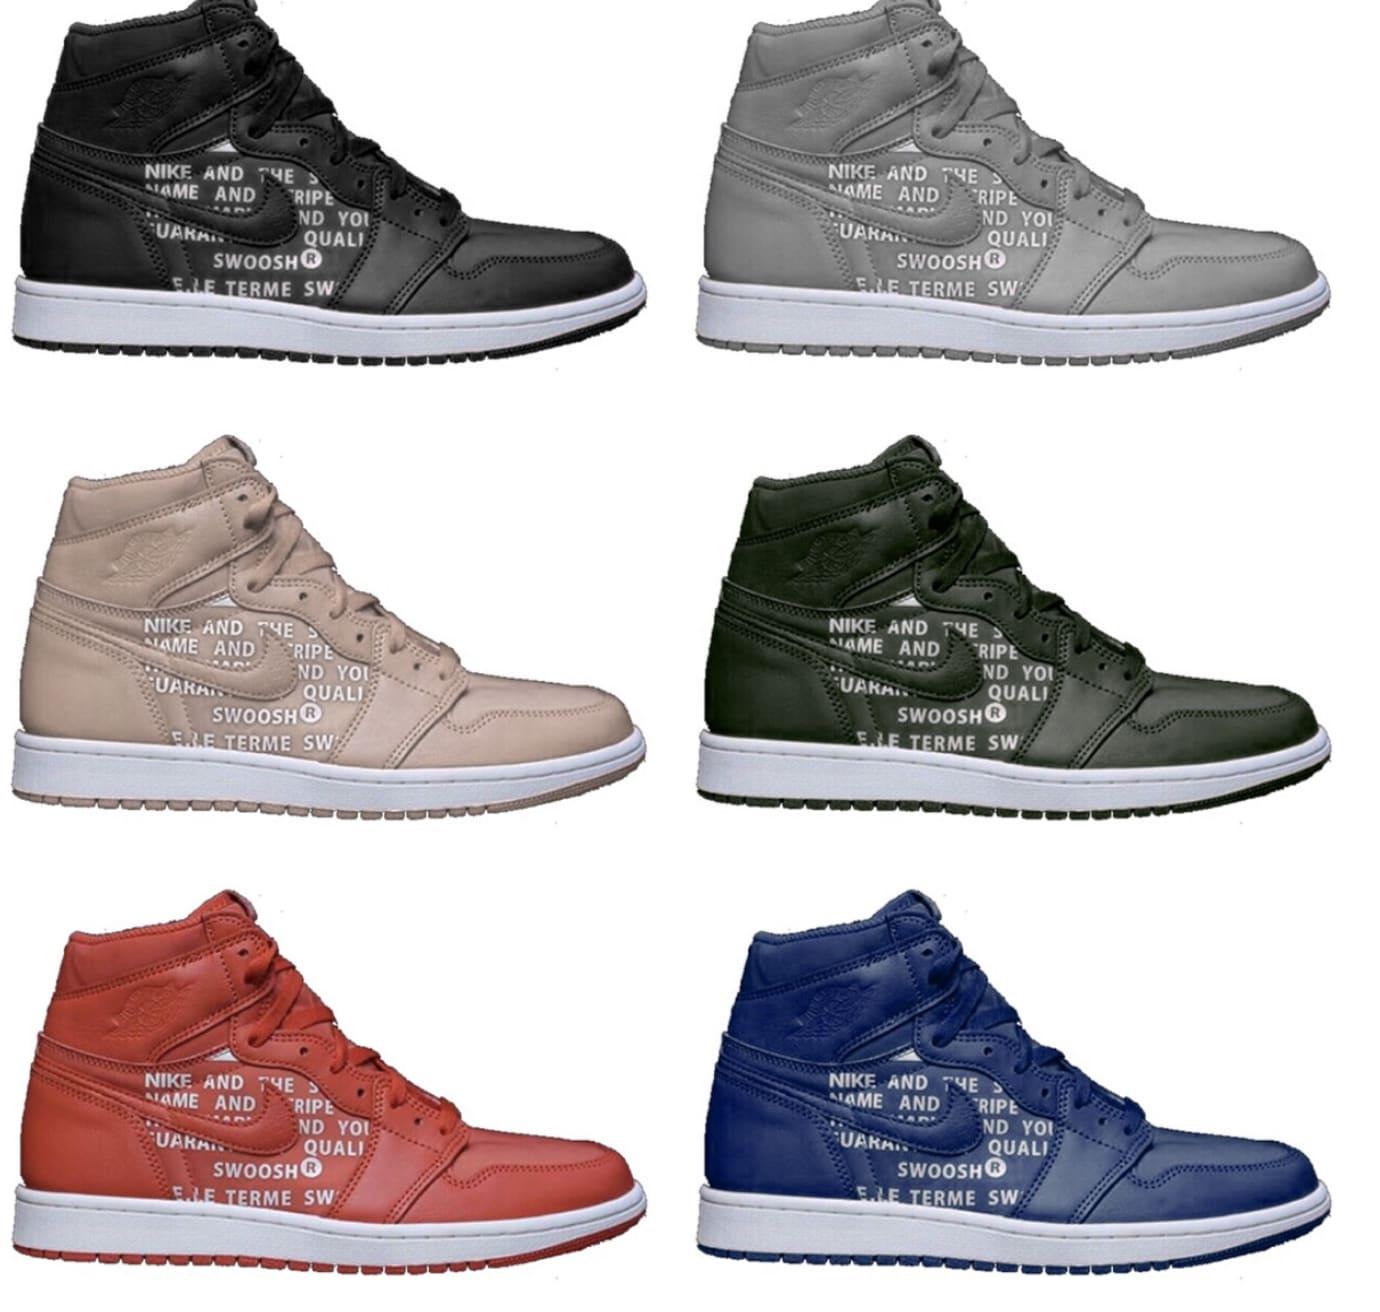 Air Jordan 1 Canvas/Leather Pack